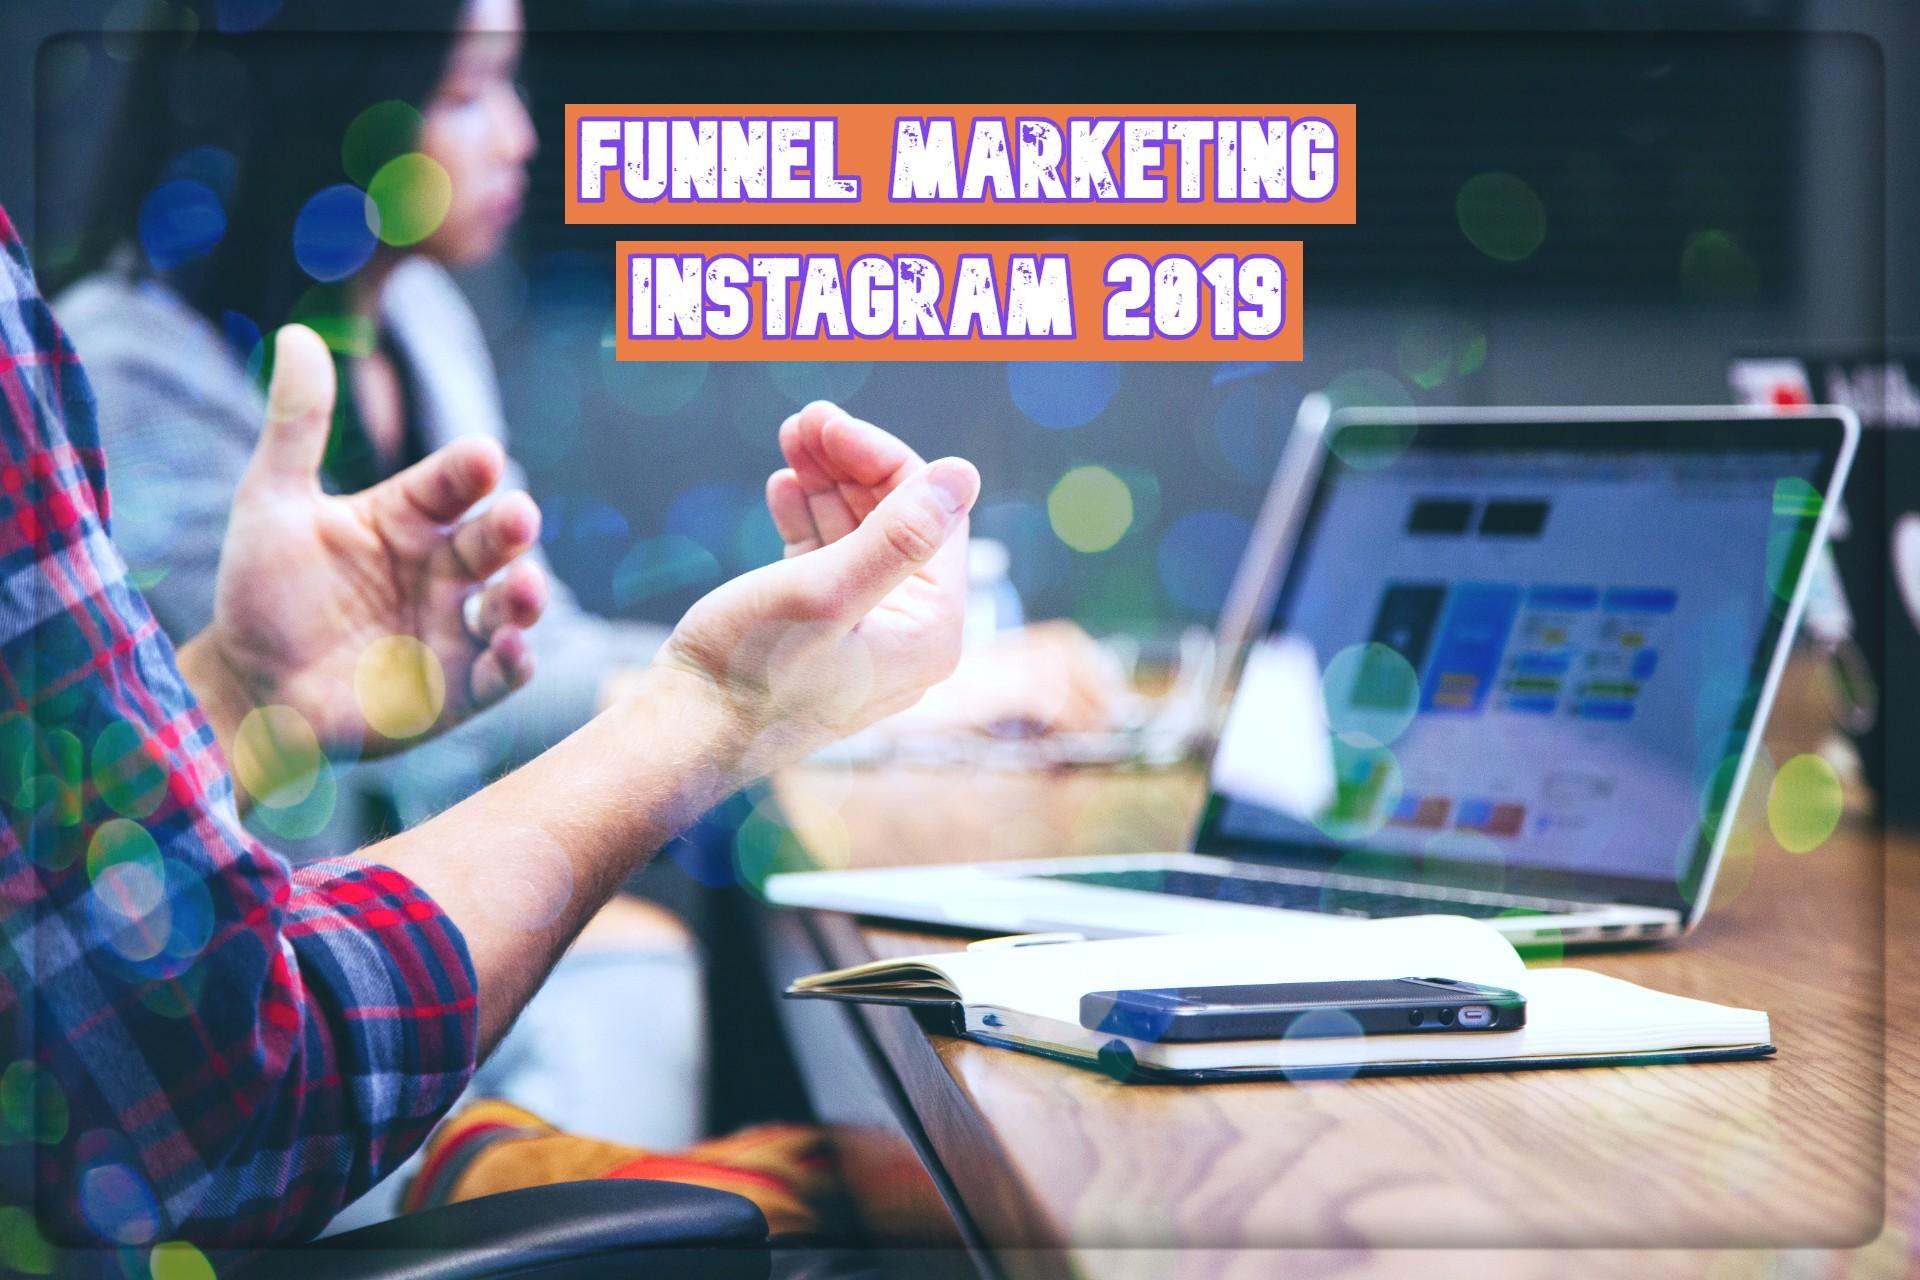 funnel marketing di Instagram untuk bisnis online 2019